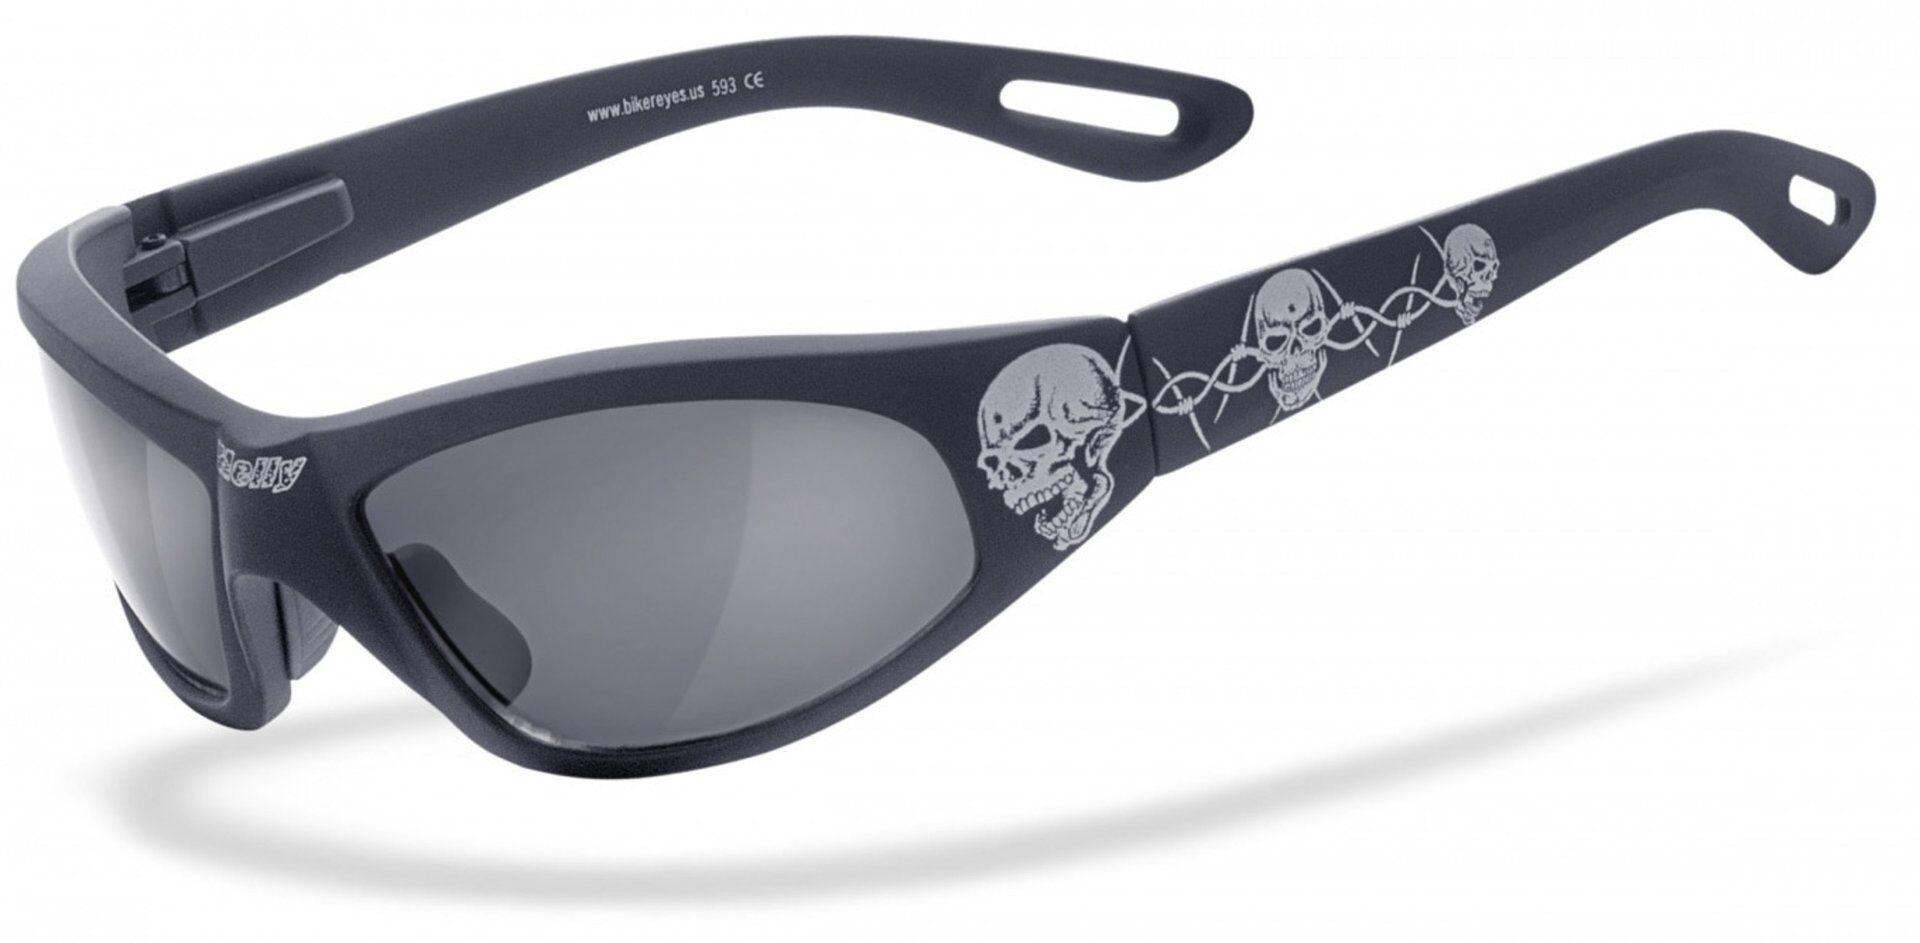 Helly Bikereyes Black Angel Sunglasses Black White One Size